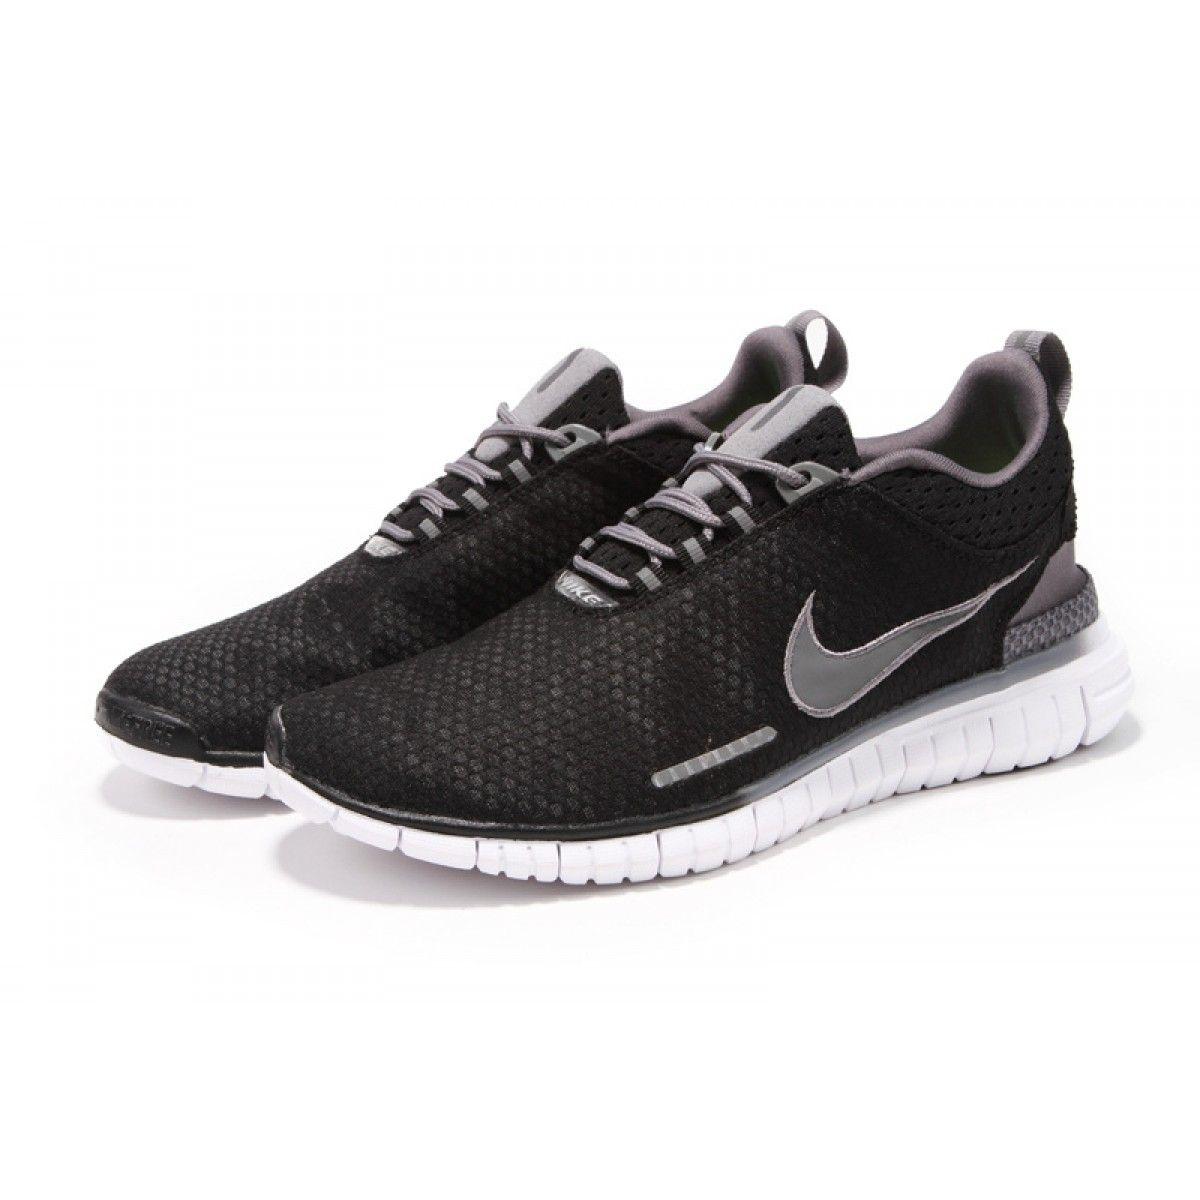 Nike Free OG Breathe Running Shoes Black Grey | Nike Free OG